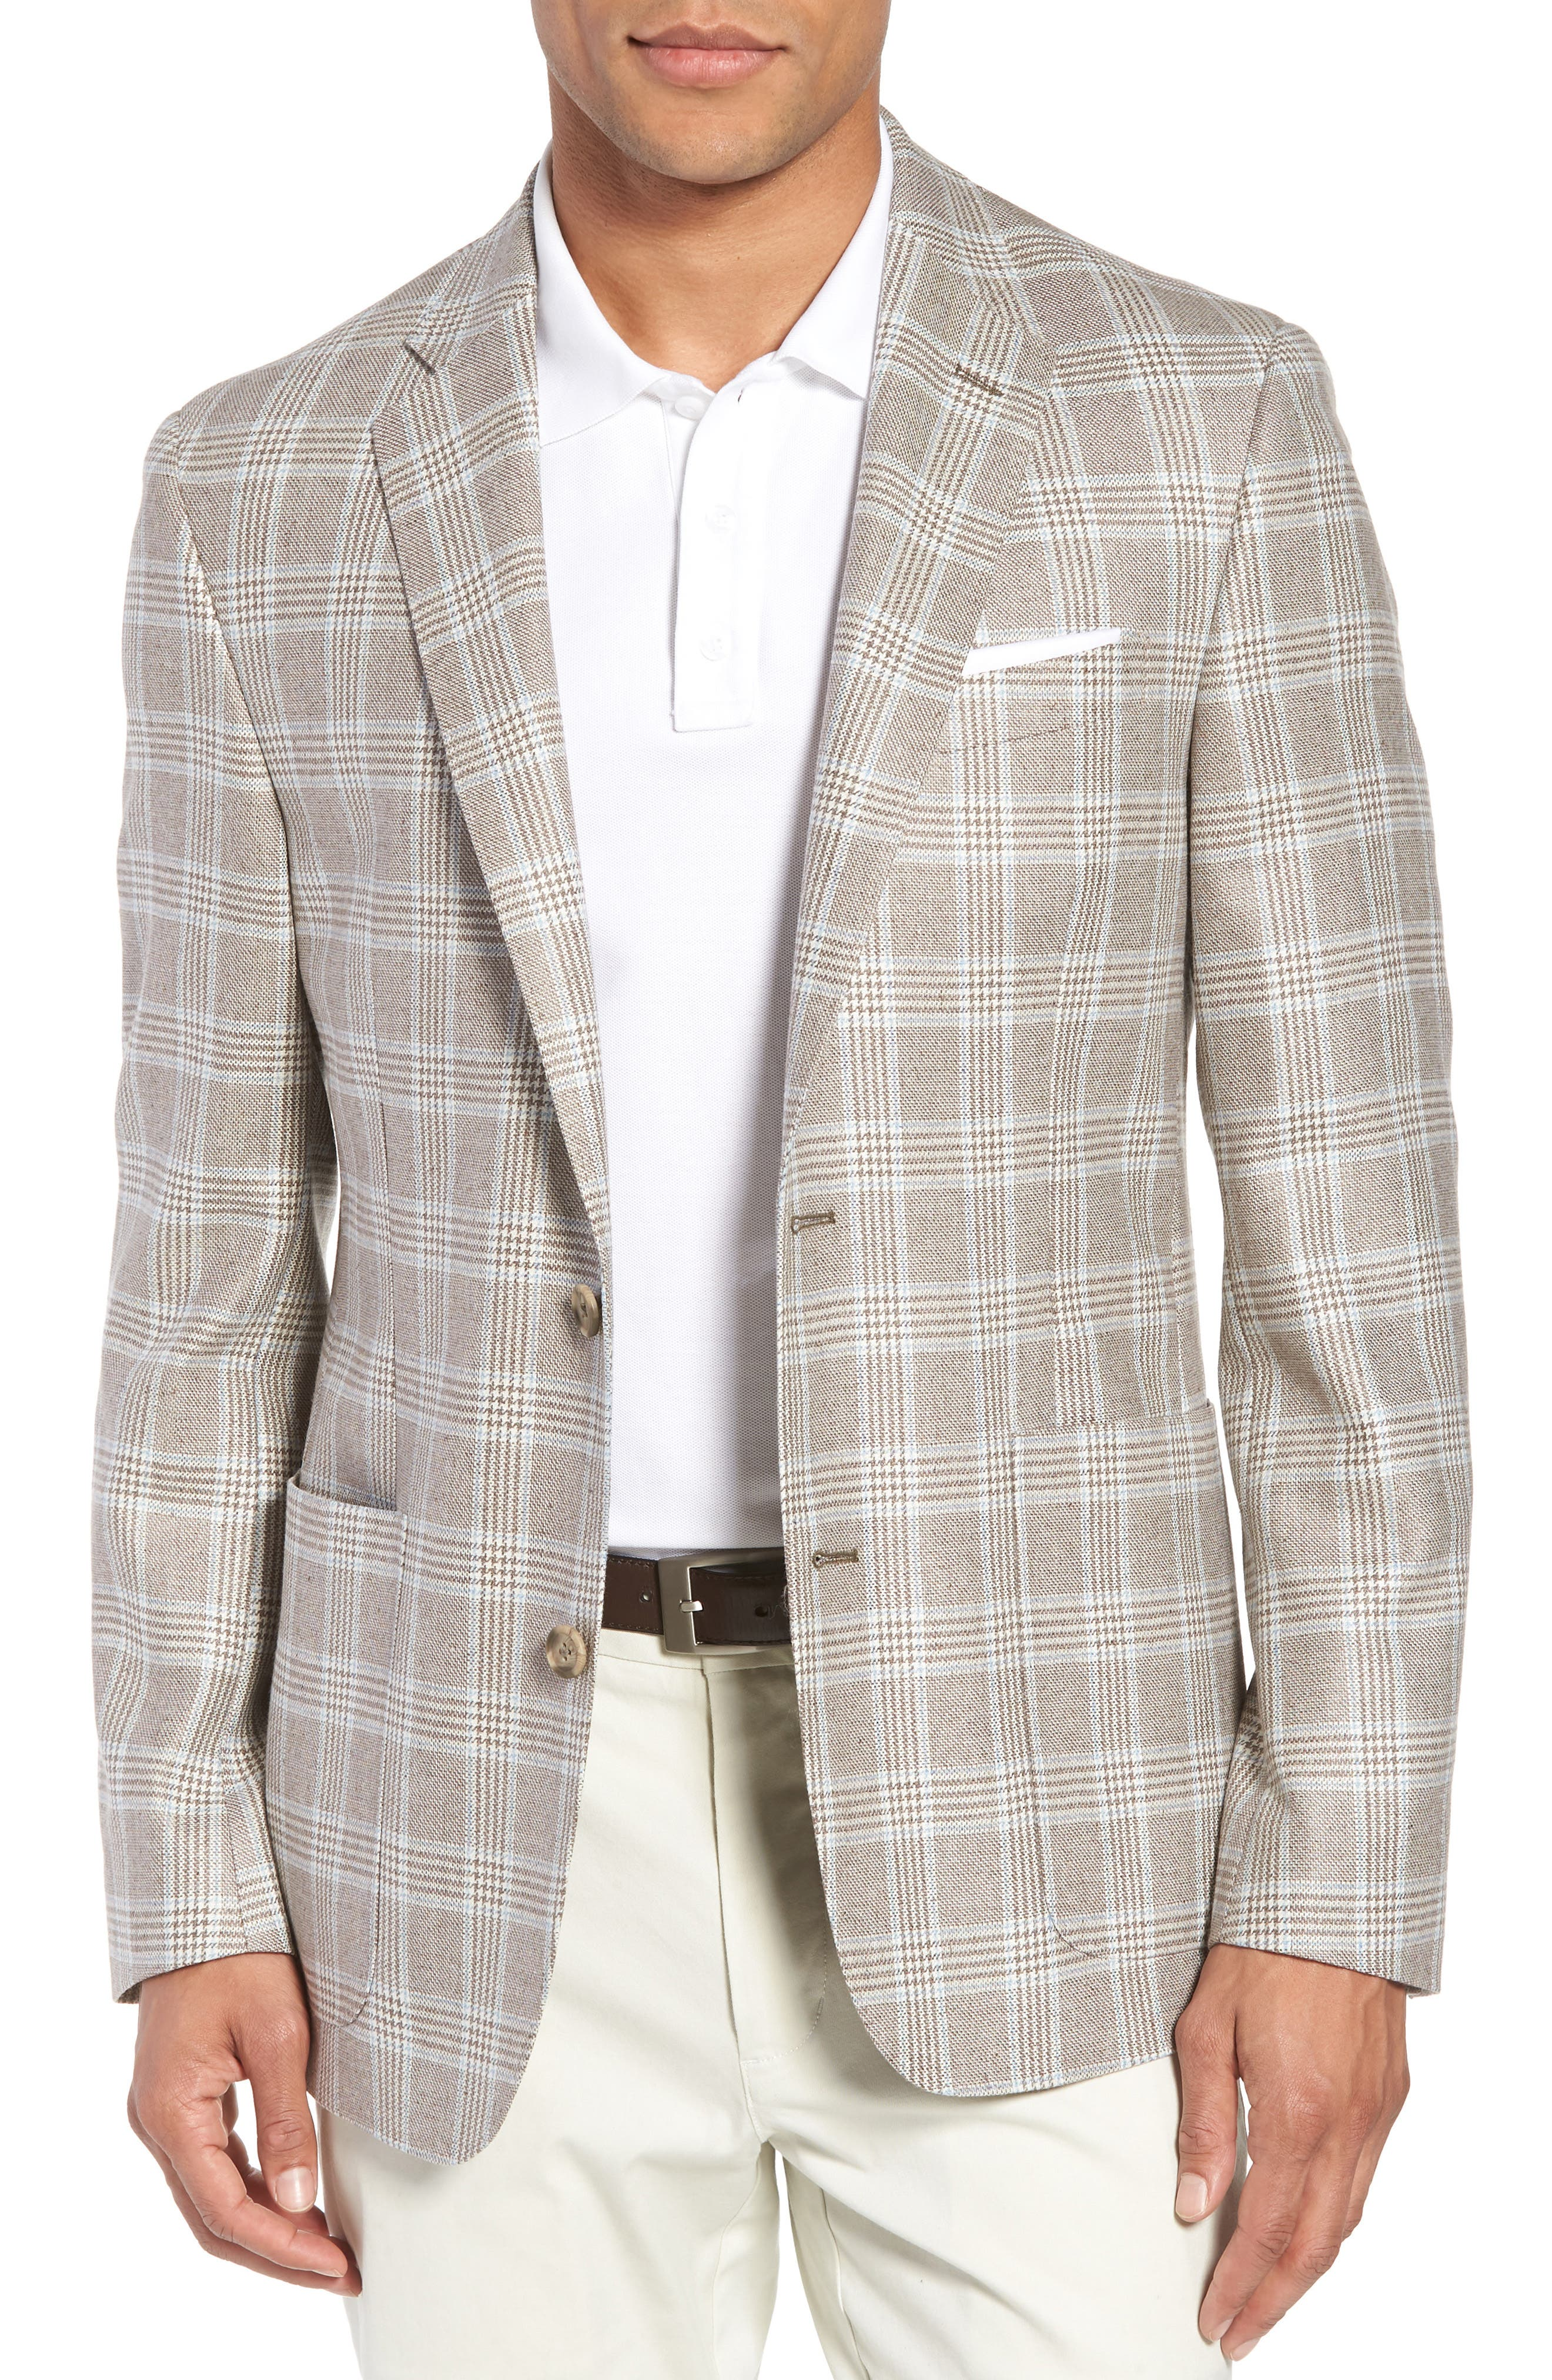 Main Image - Nordstrom Men's Shop Trim Fit Plaid Silk & Wool Sport Coat